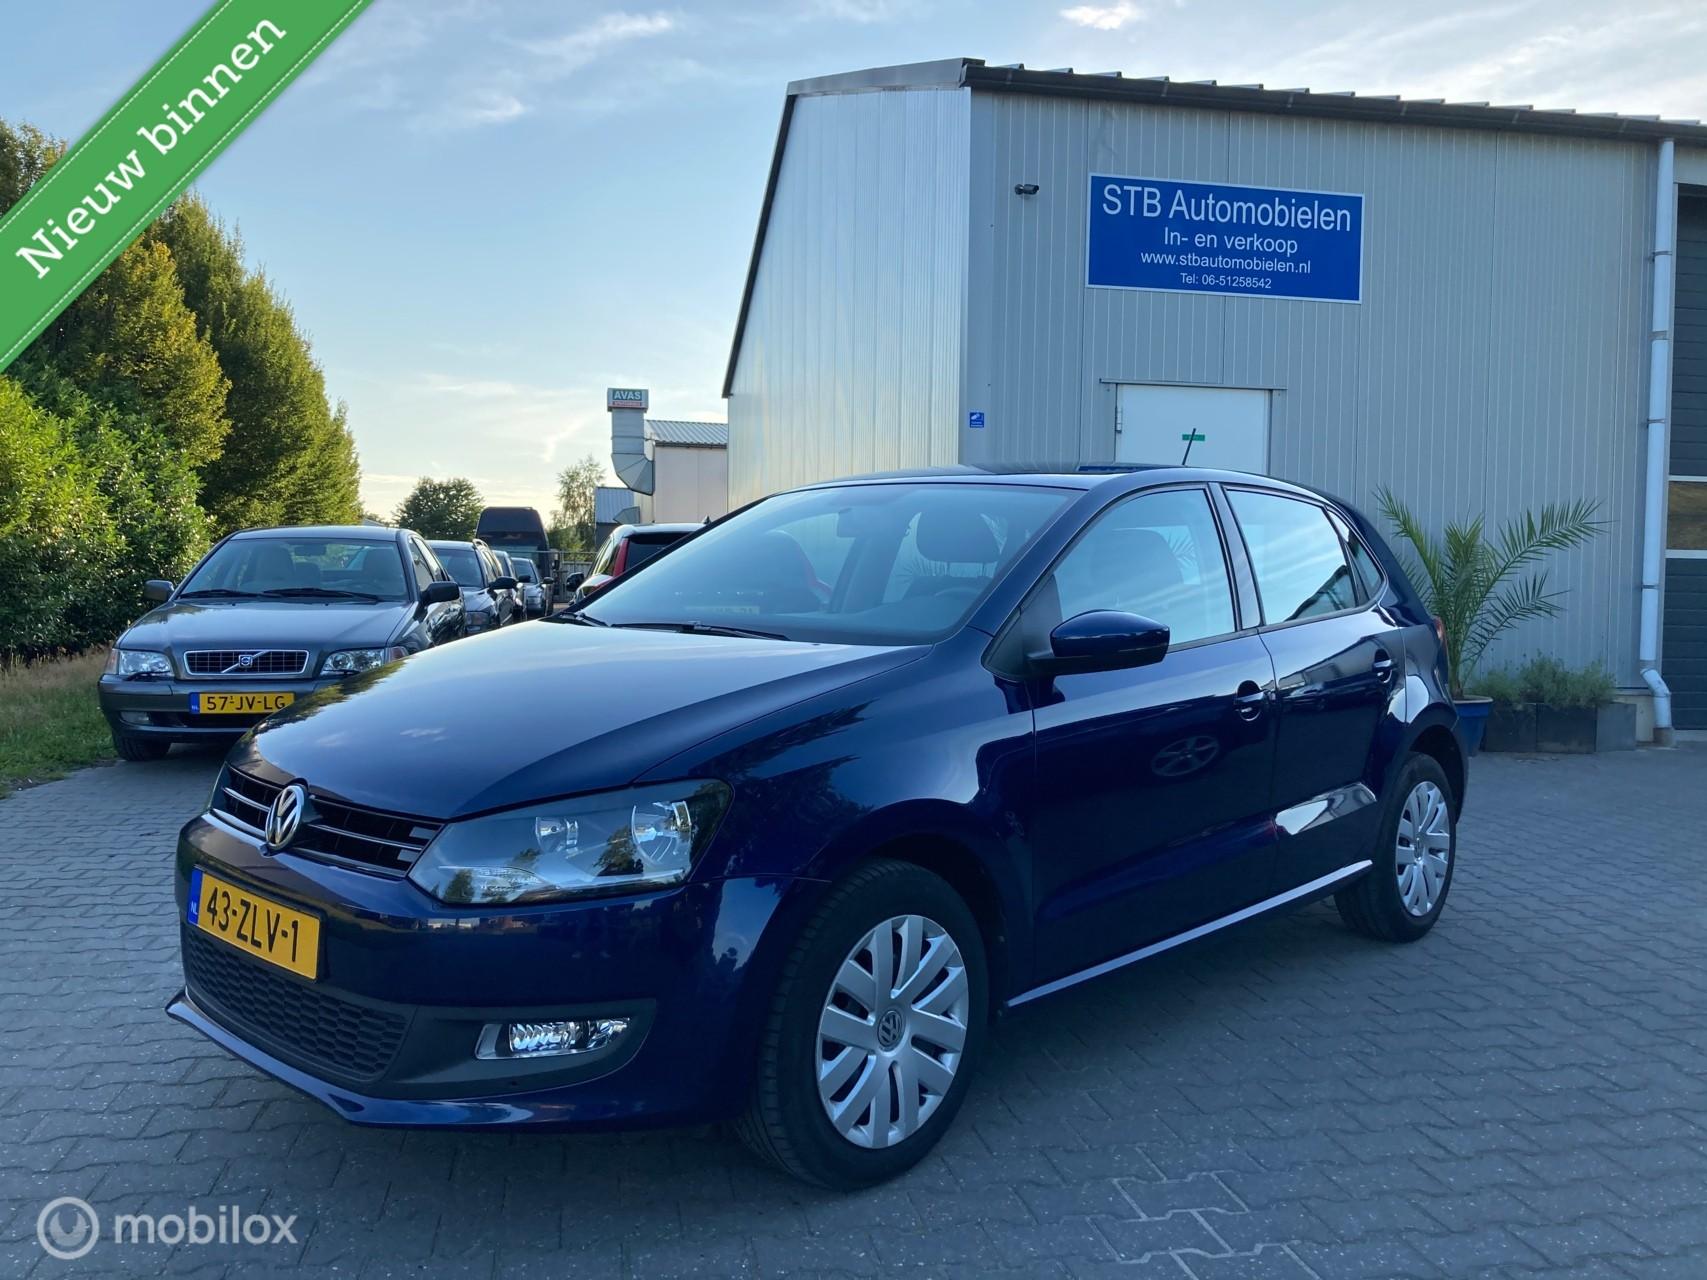 Volkswagen Polo 1.2 TSI BlueMotion Comfortline, Cruise